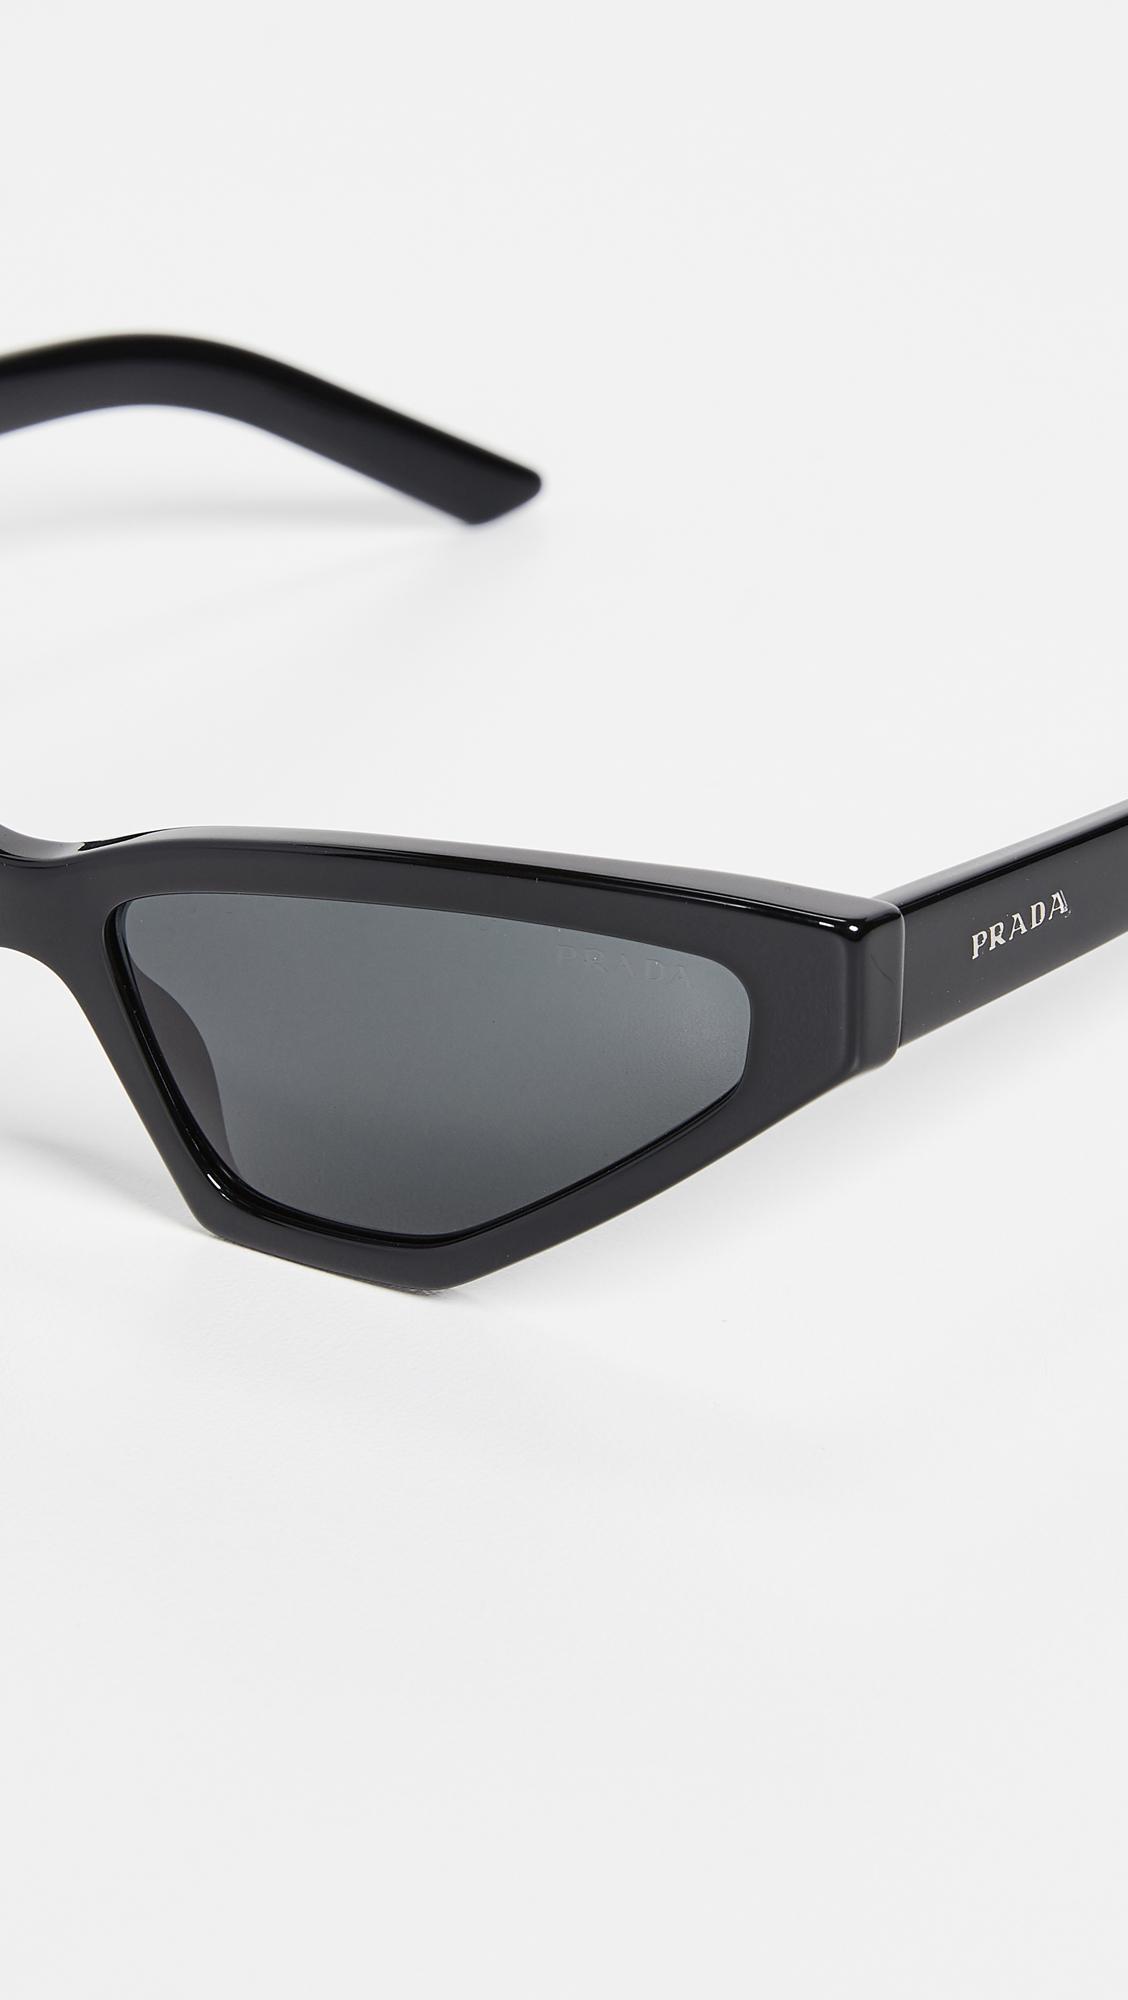 36200e9d1ba2 Prada Pr 12vs Millennial Narrow Cat Eye Sunglasses in Black - Lyst